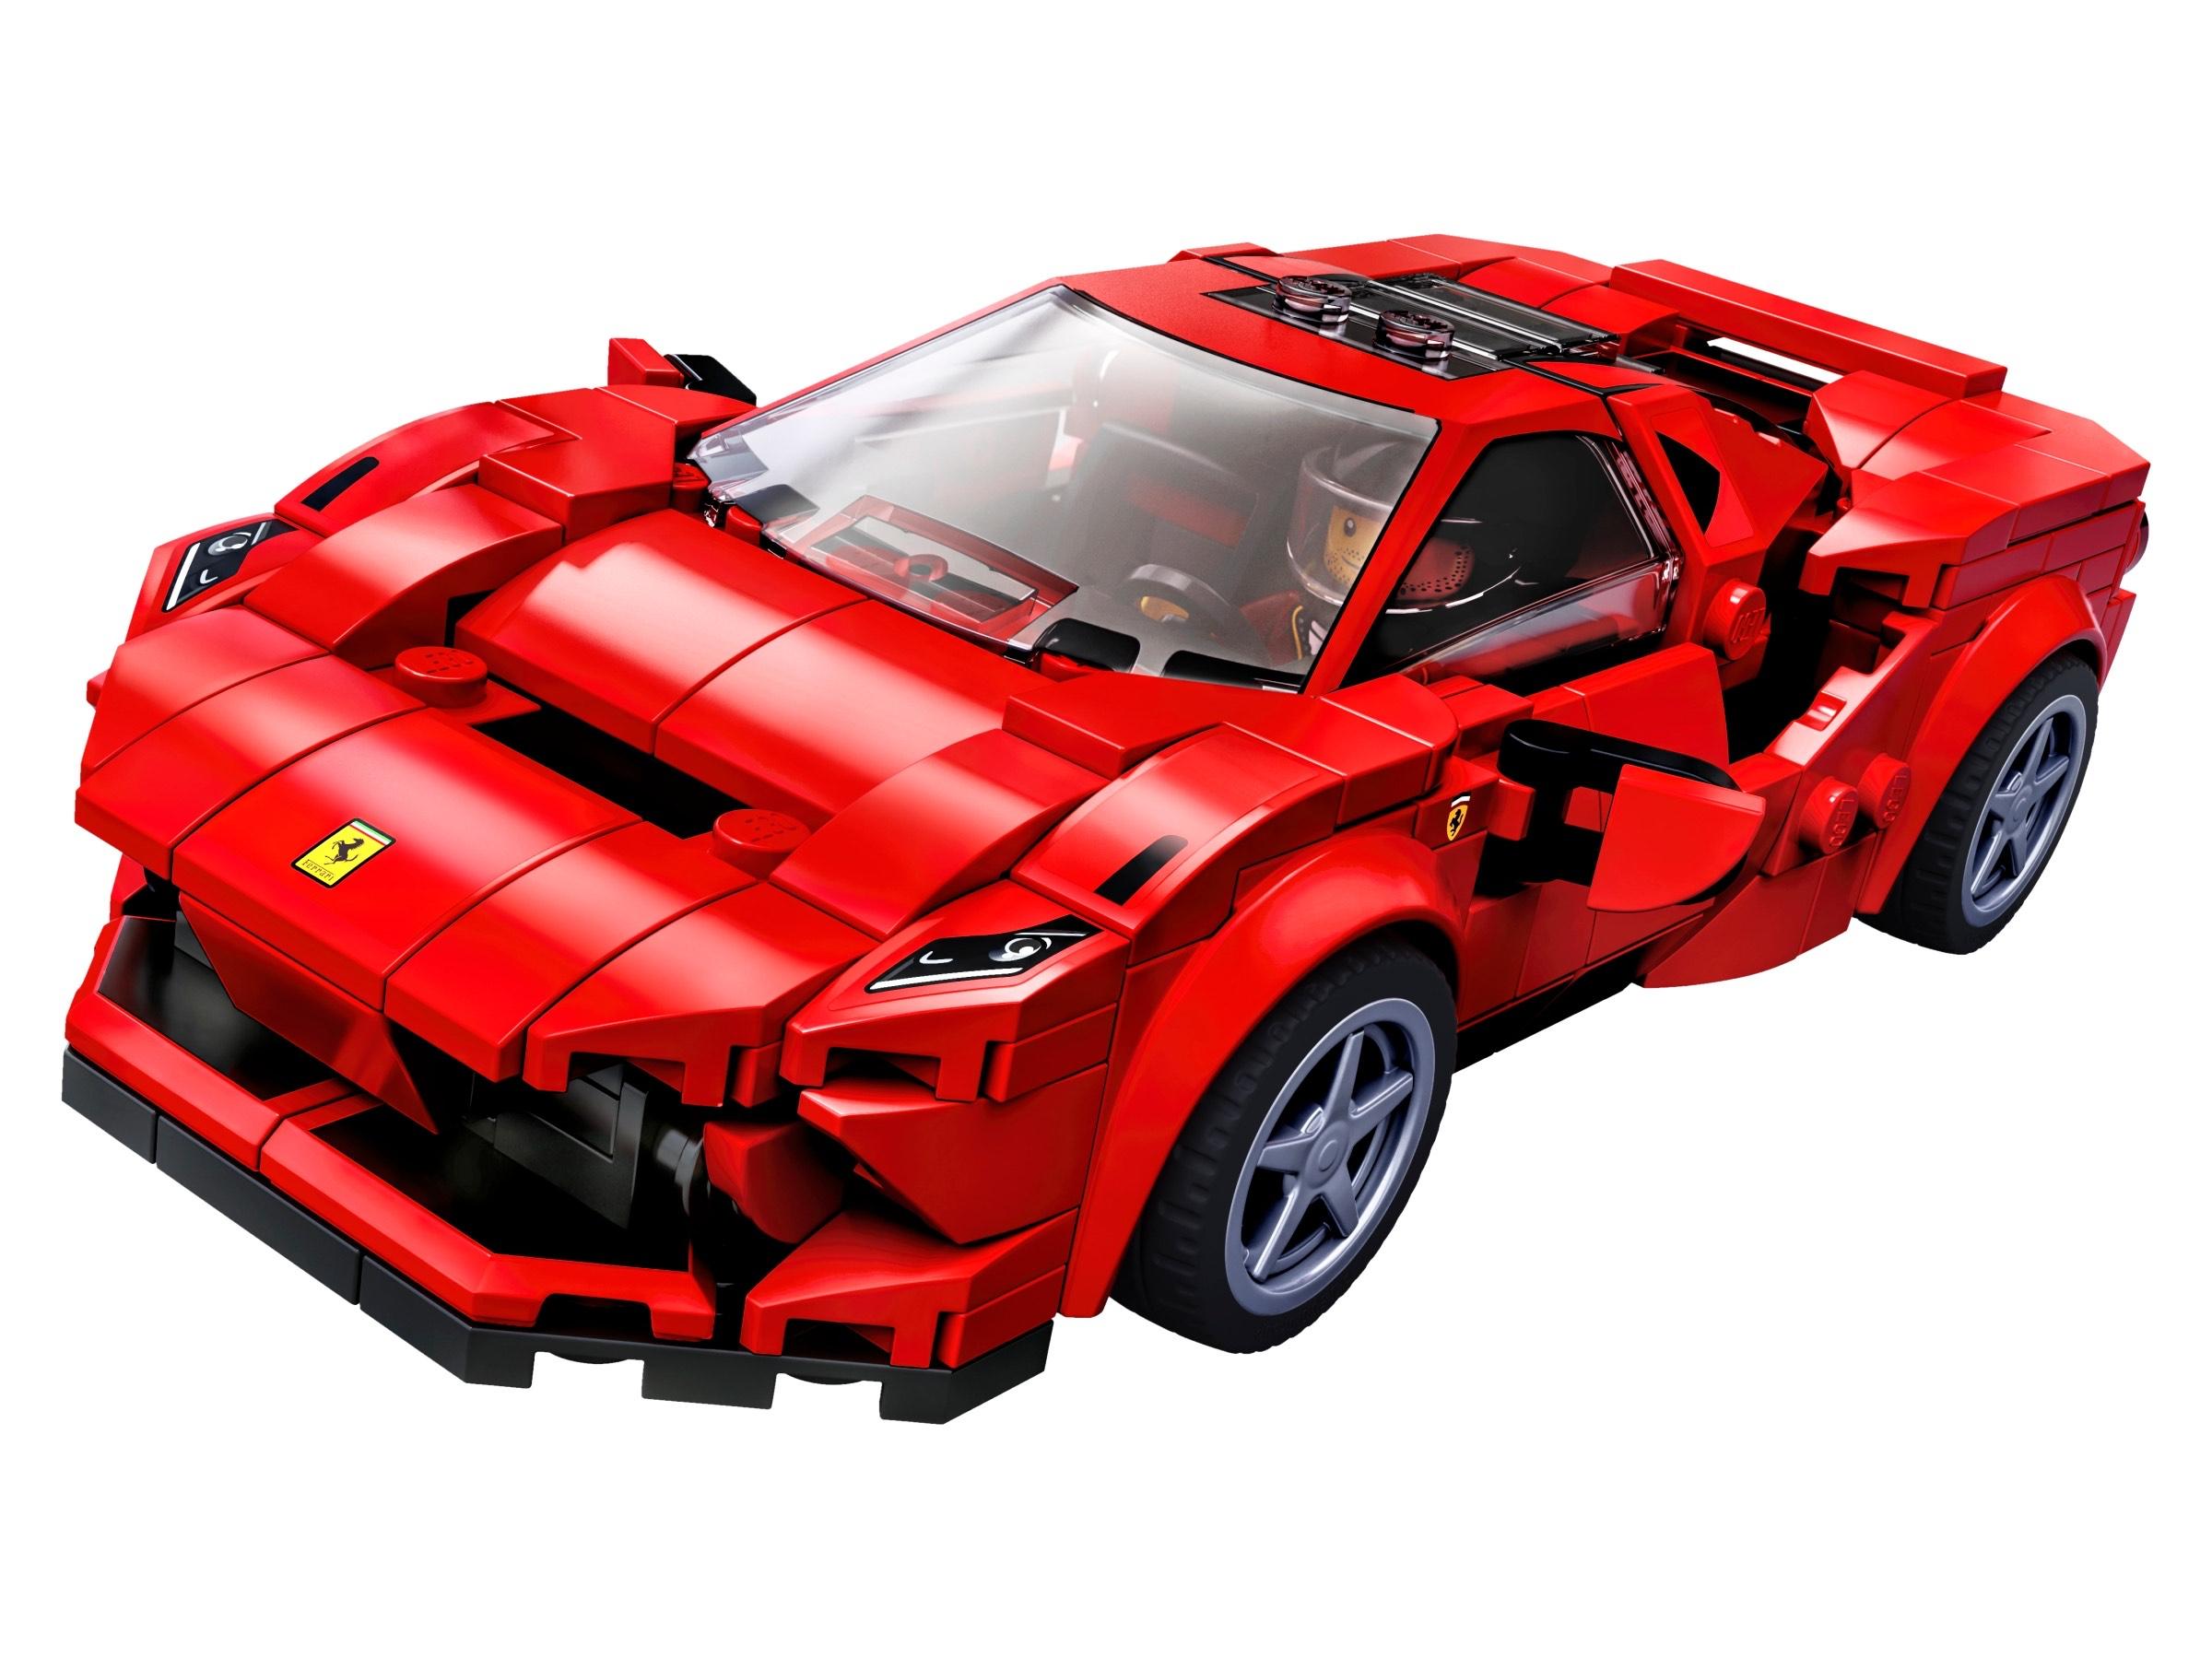 Lego Speed Champions Ferrari F8 Tributo und Nissan GT-R Nismo